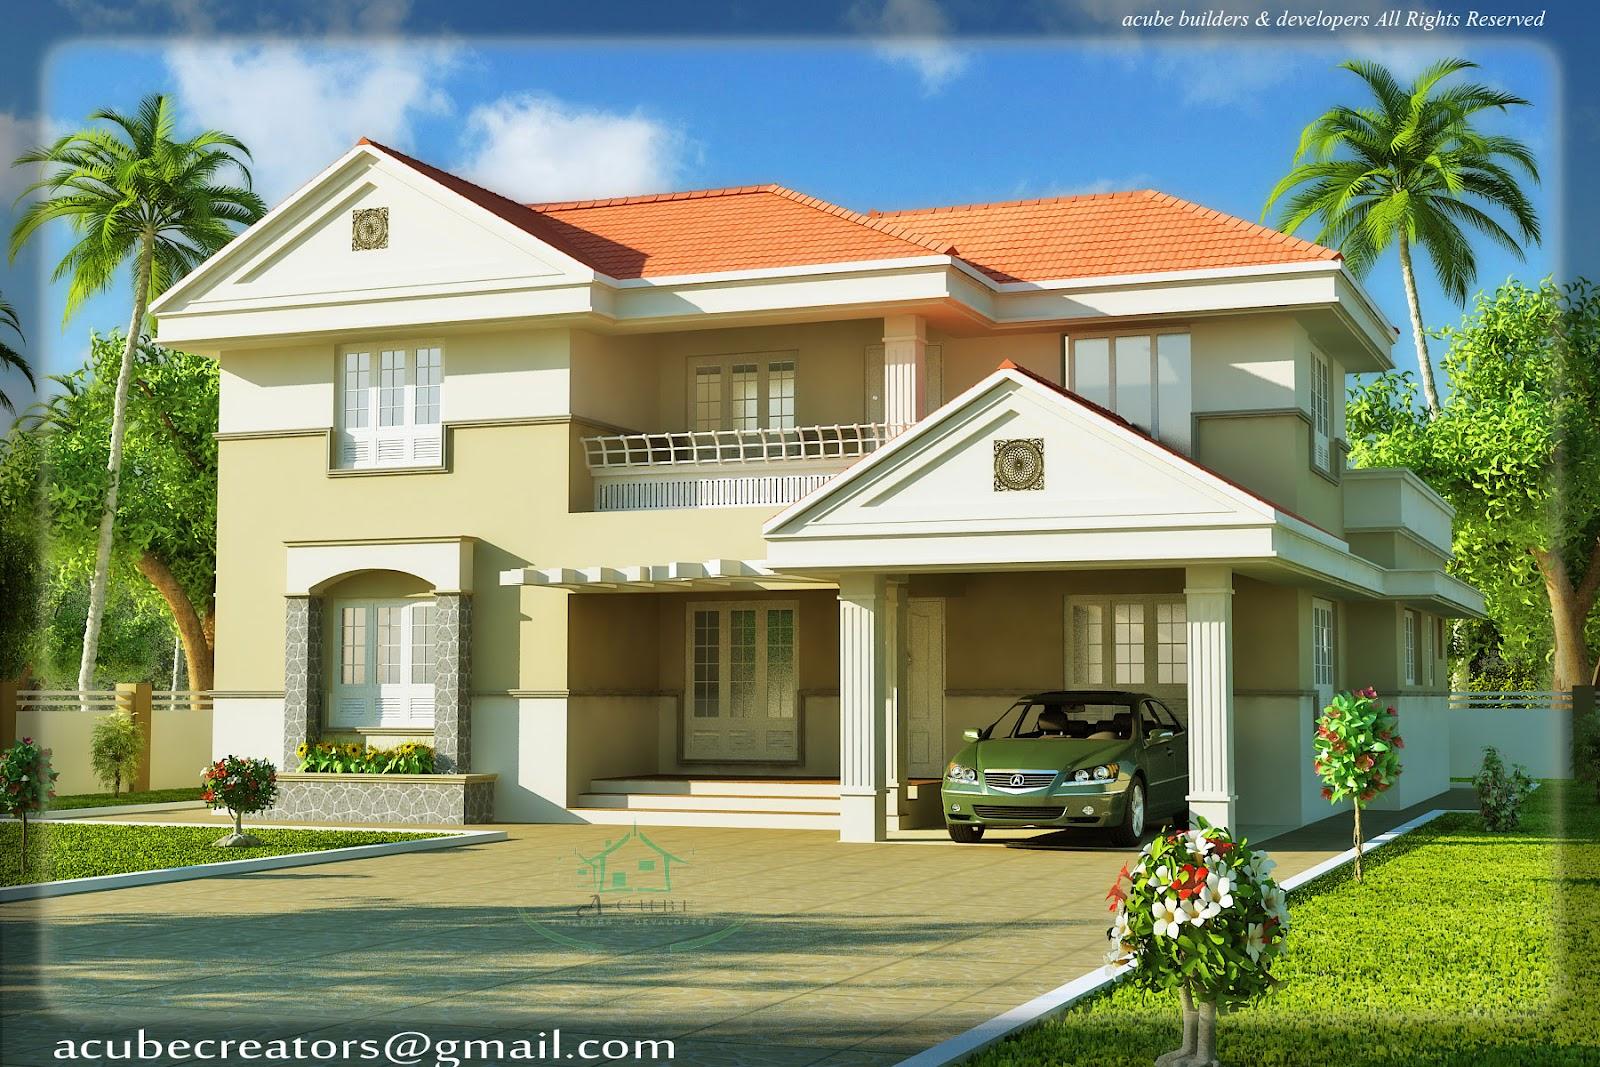 Keralahousedesigns Acube Builders Developers Elevation 3d View